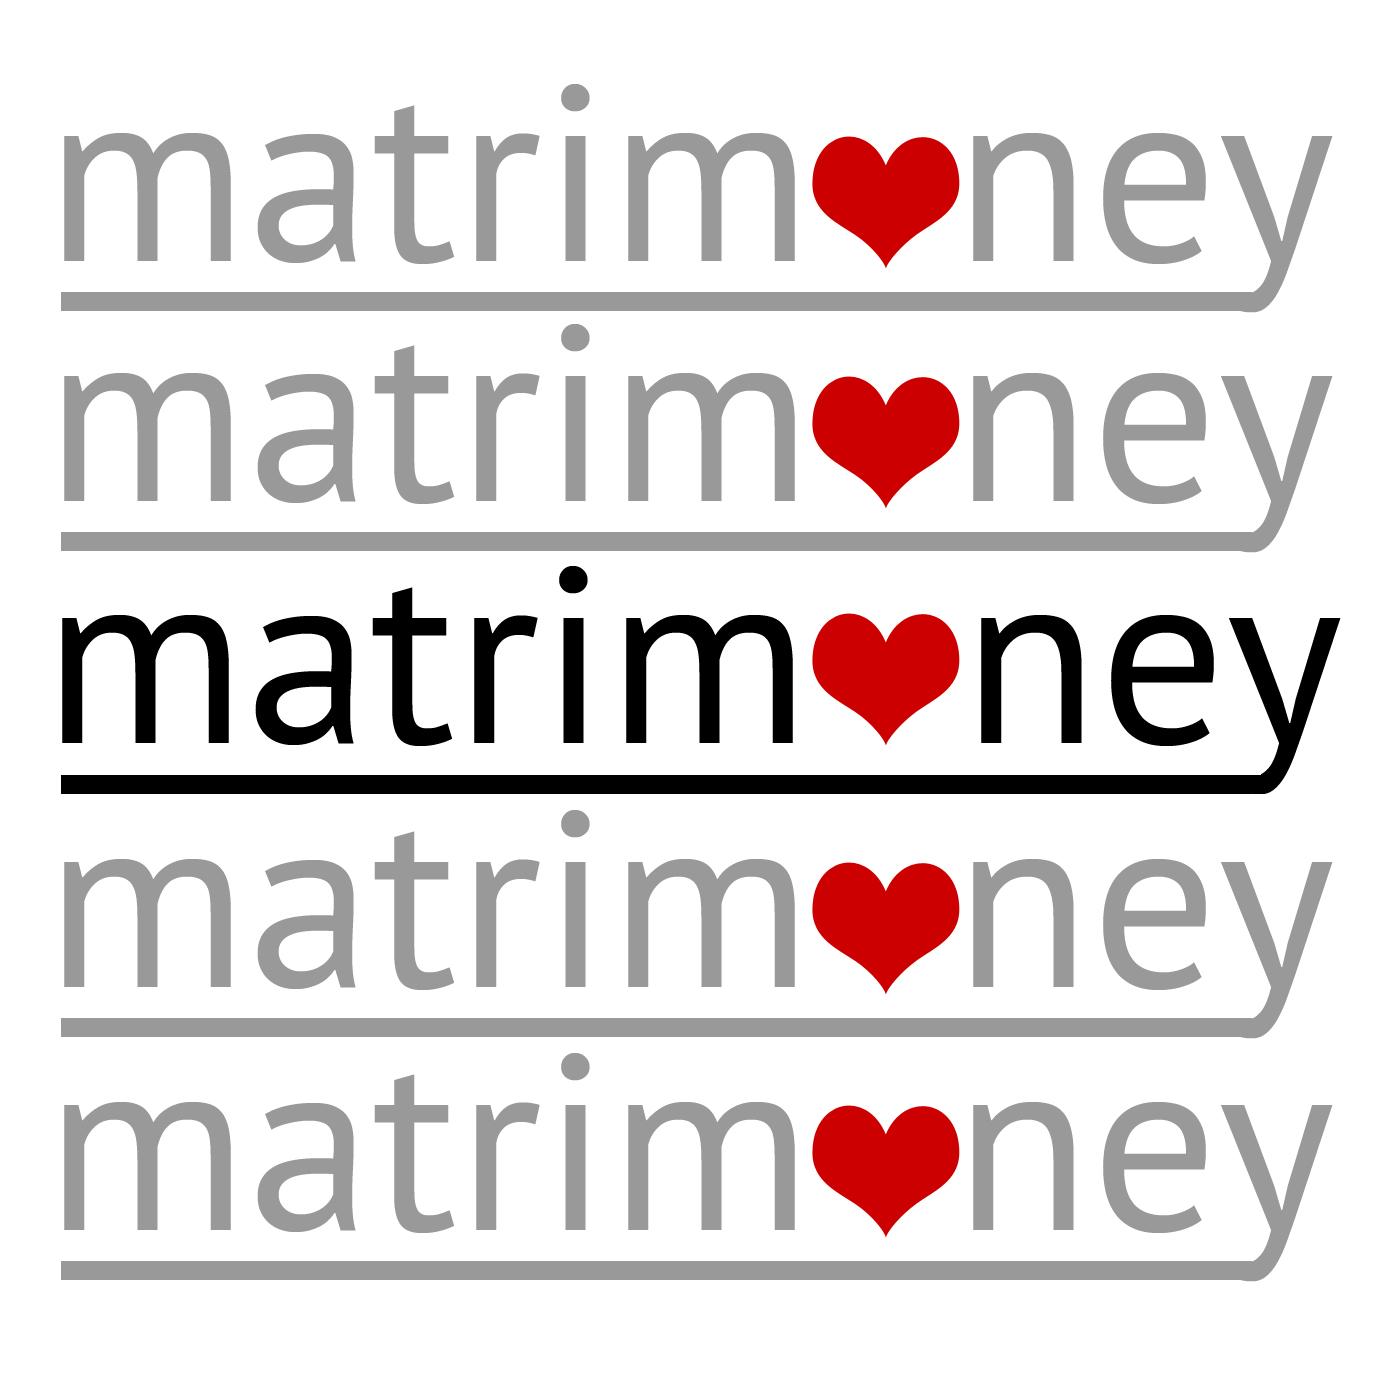 <![CDATA[Matrimoney]]>